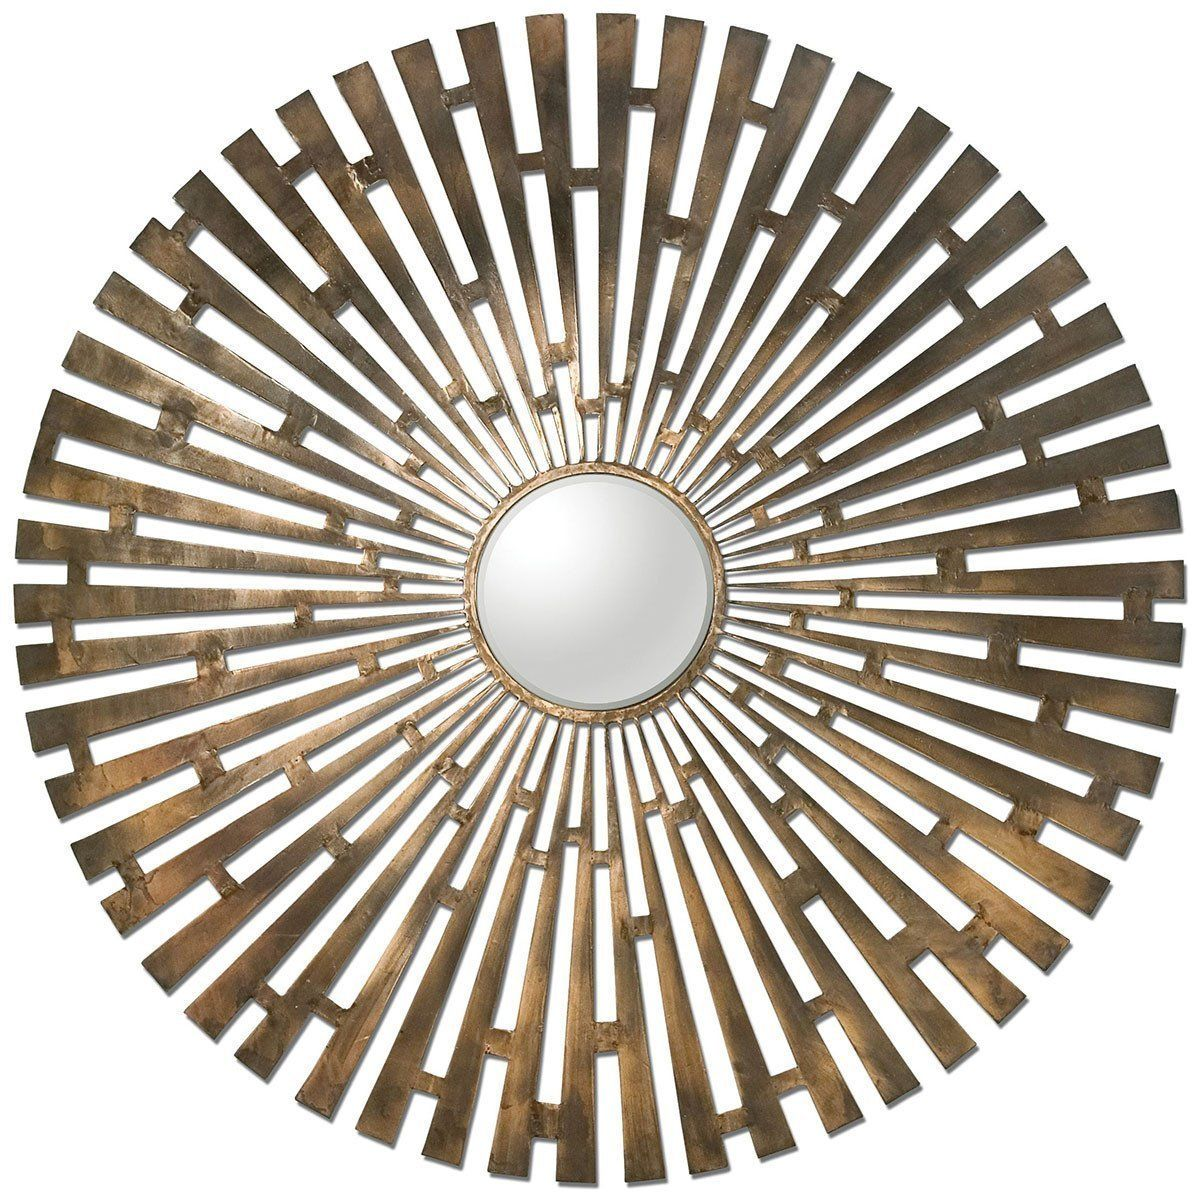 Cyan Design 06148 Wheelhse Reflection Mirror